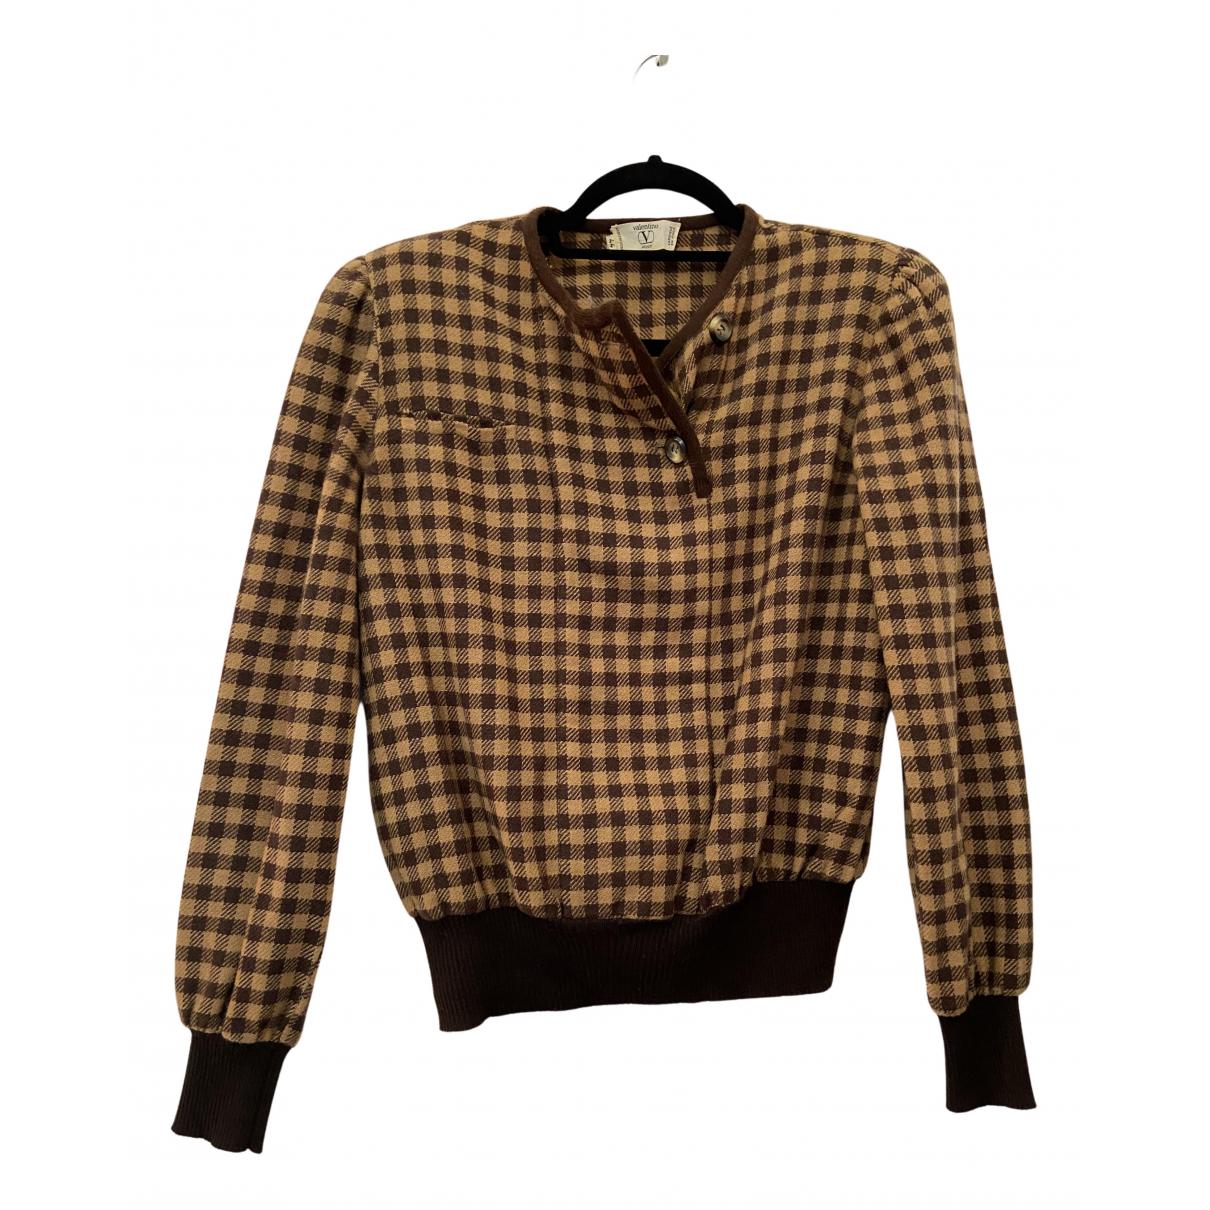 Valentino Garavani N Brown Knitwear for Women L International